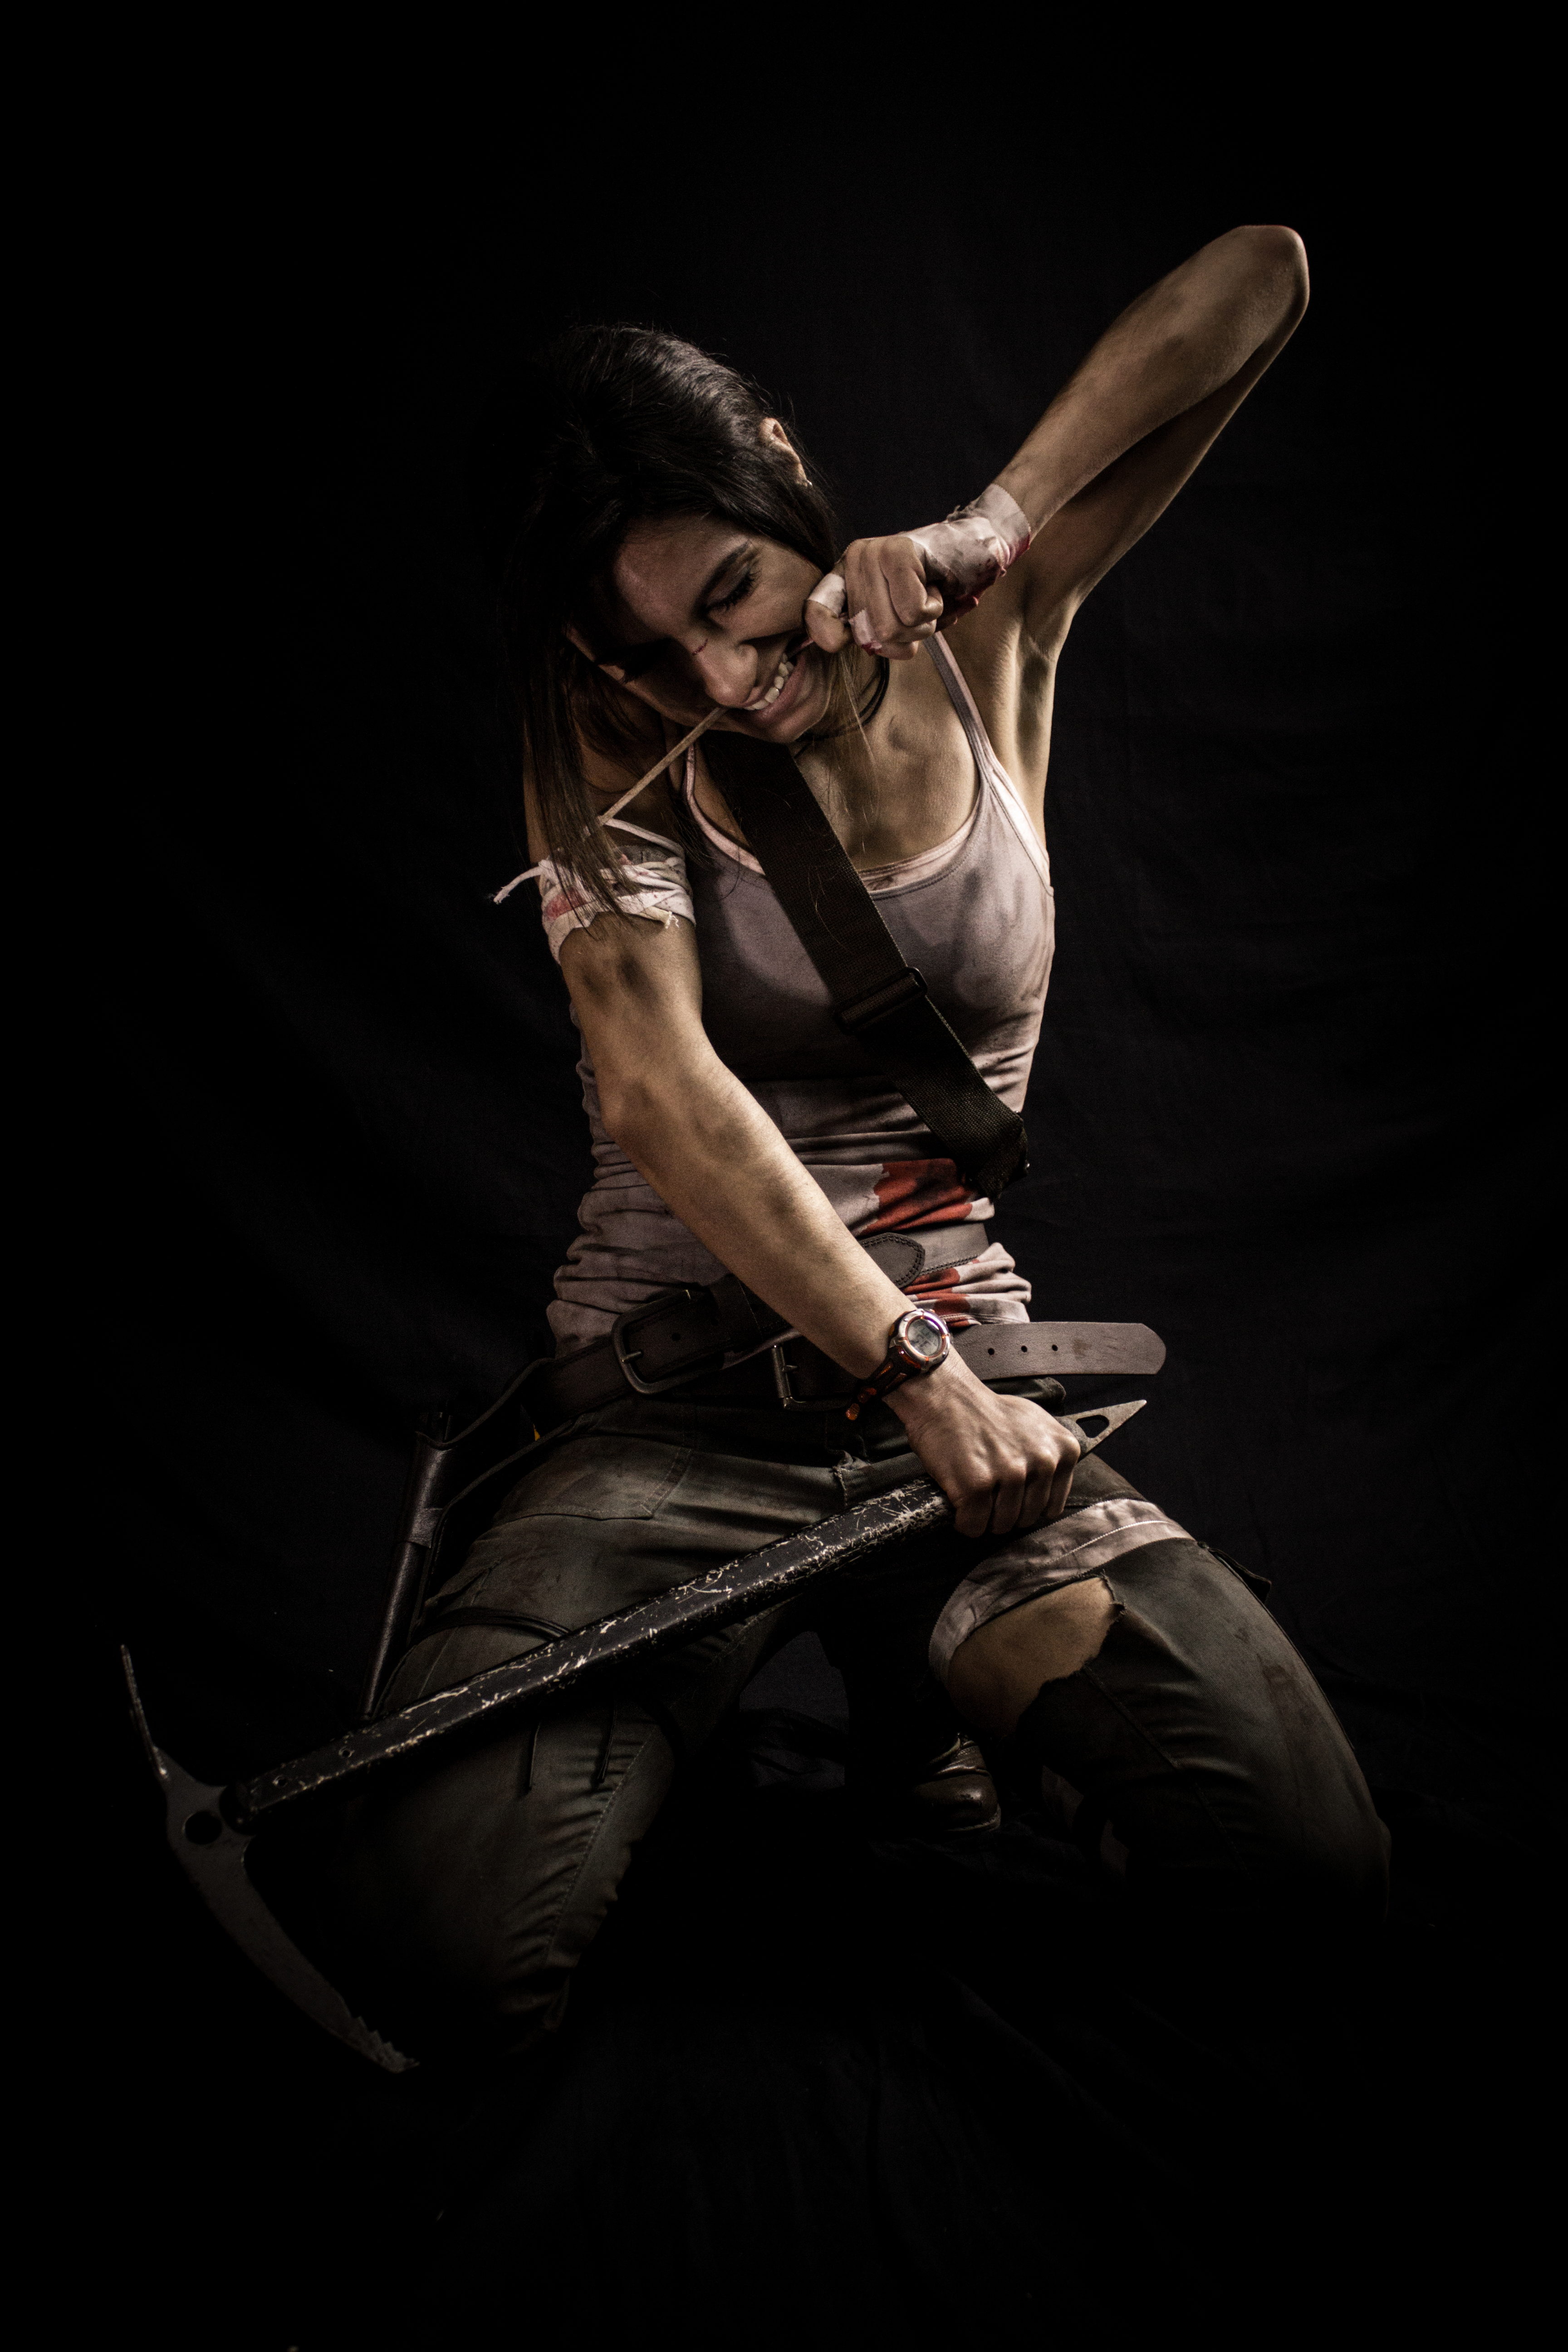 Tomb Raider Contest: Real Life Lara Croft Part. 5 by trentjones